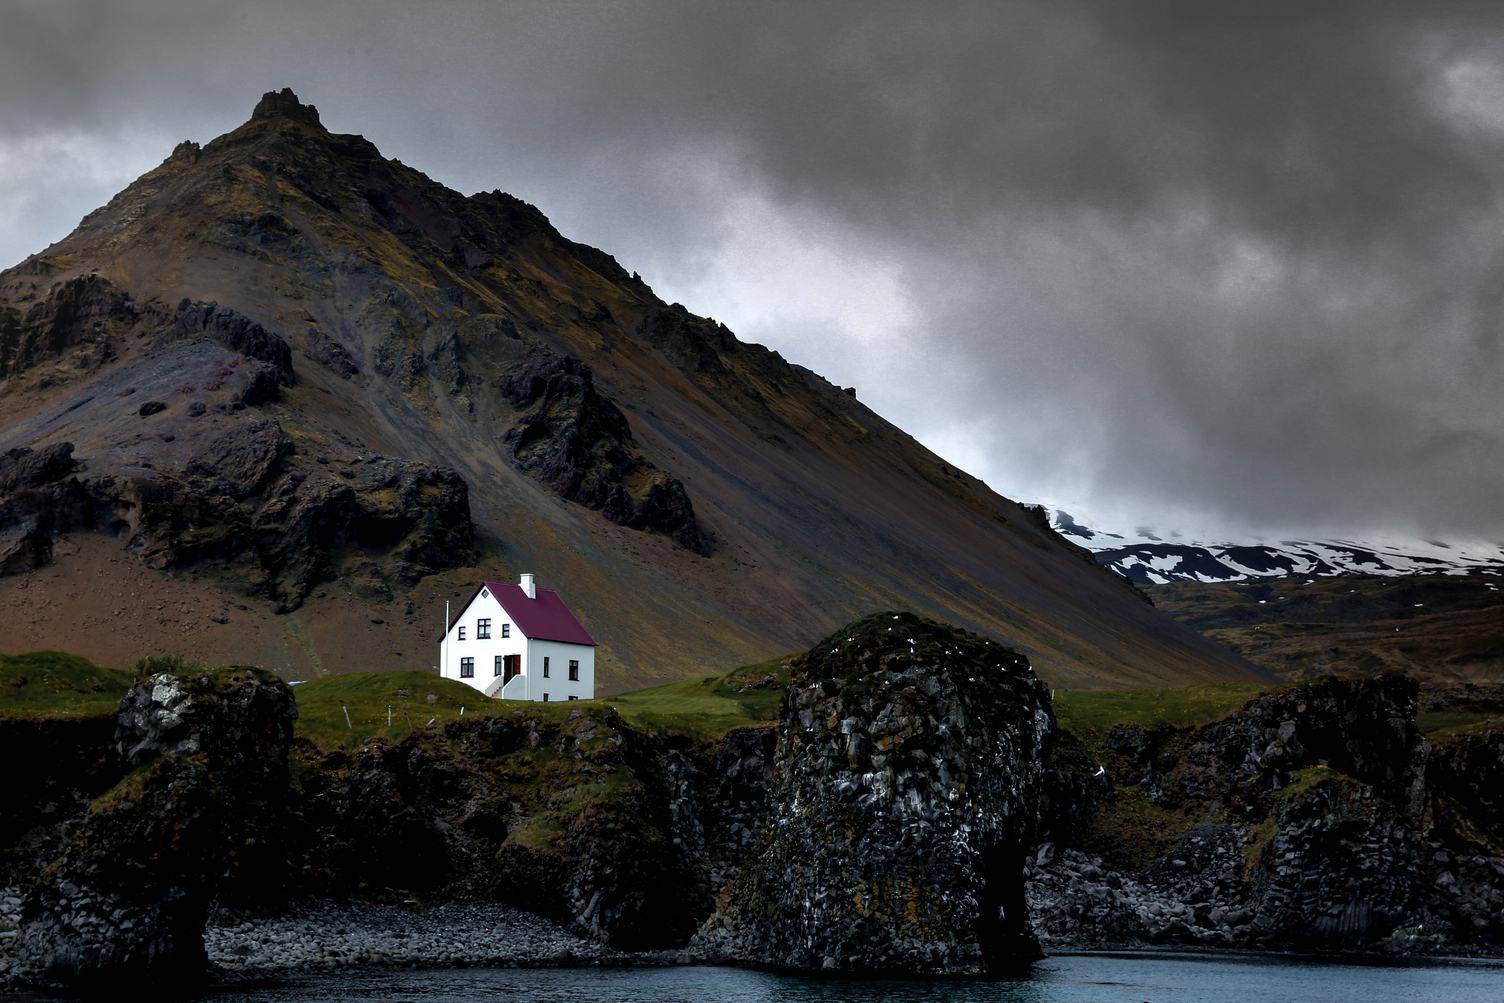 Fishing Village Arnarstapi at the Foot of the Volcano